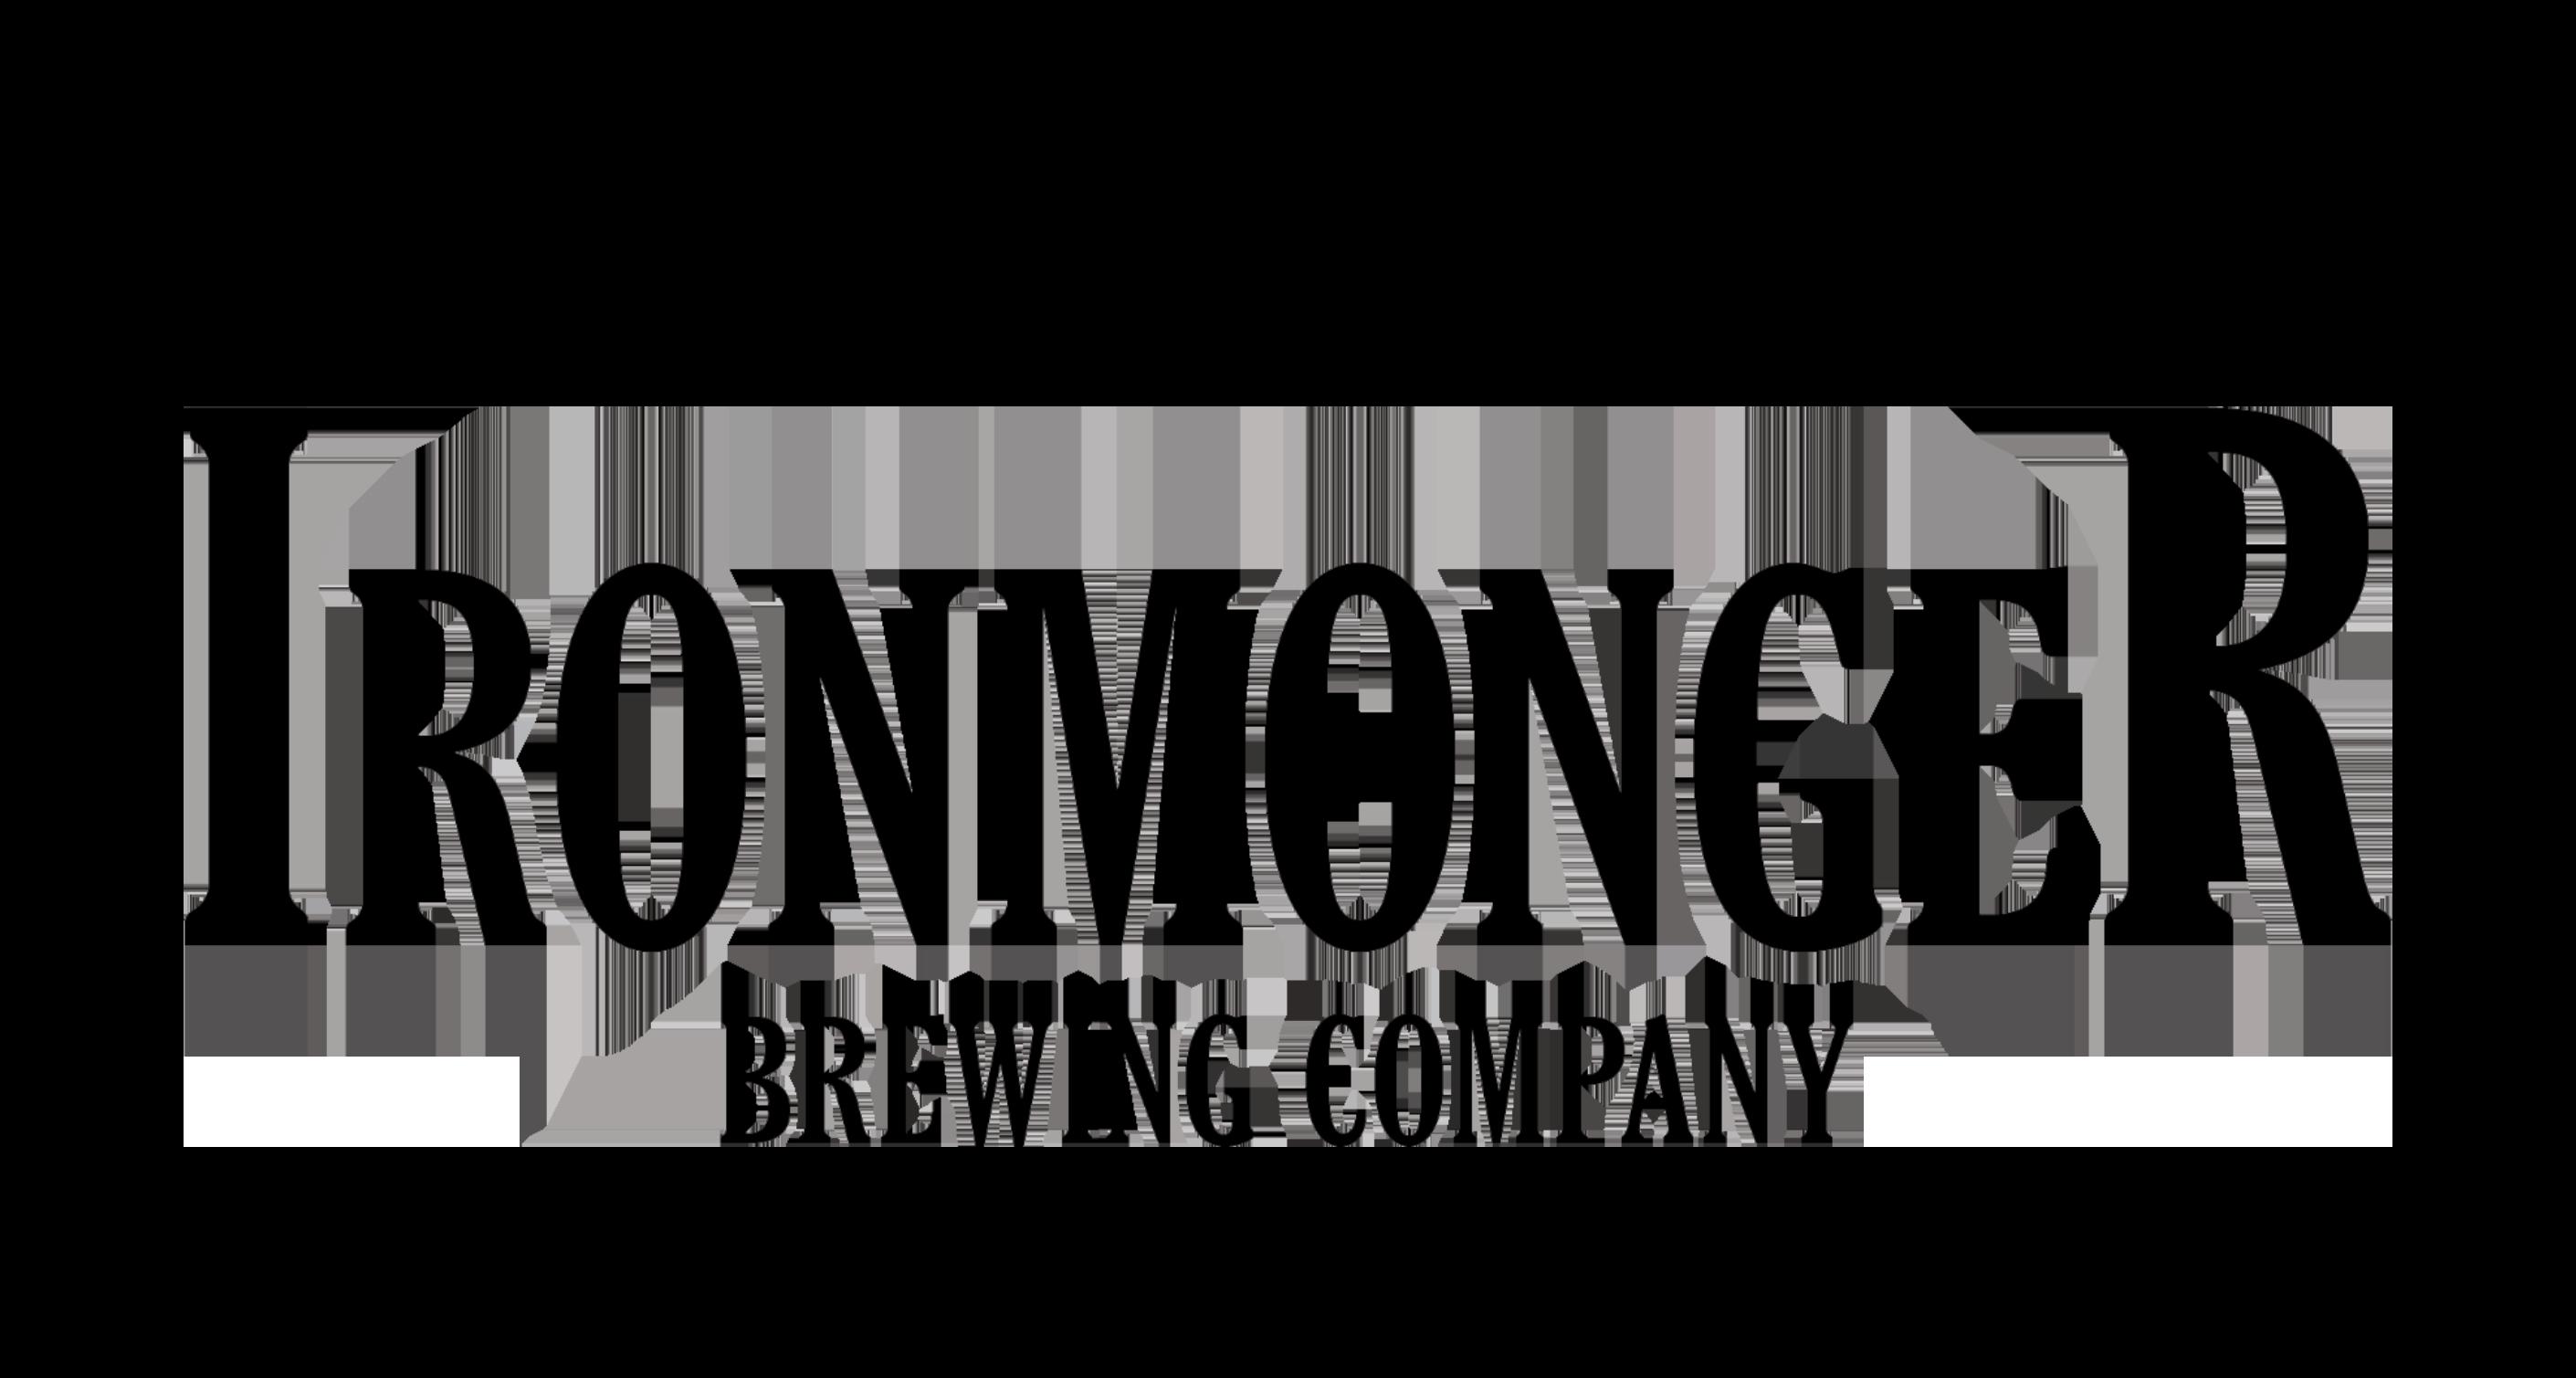 Ironmonger Brewing Company